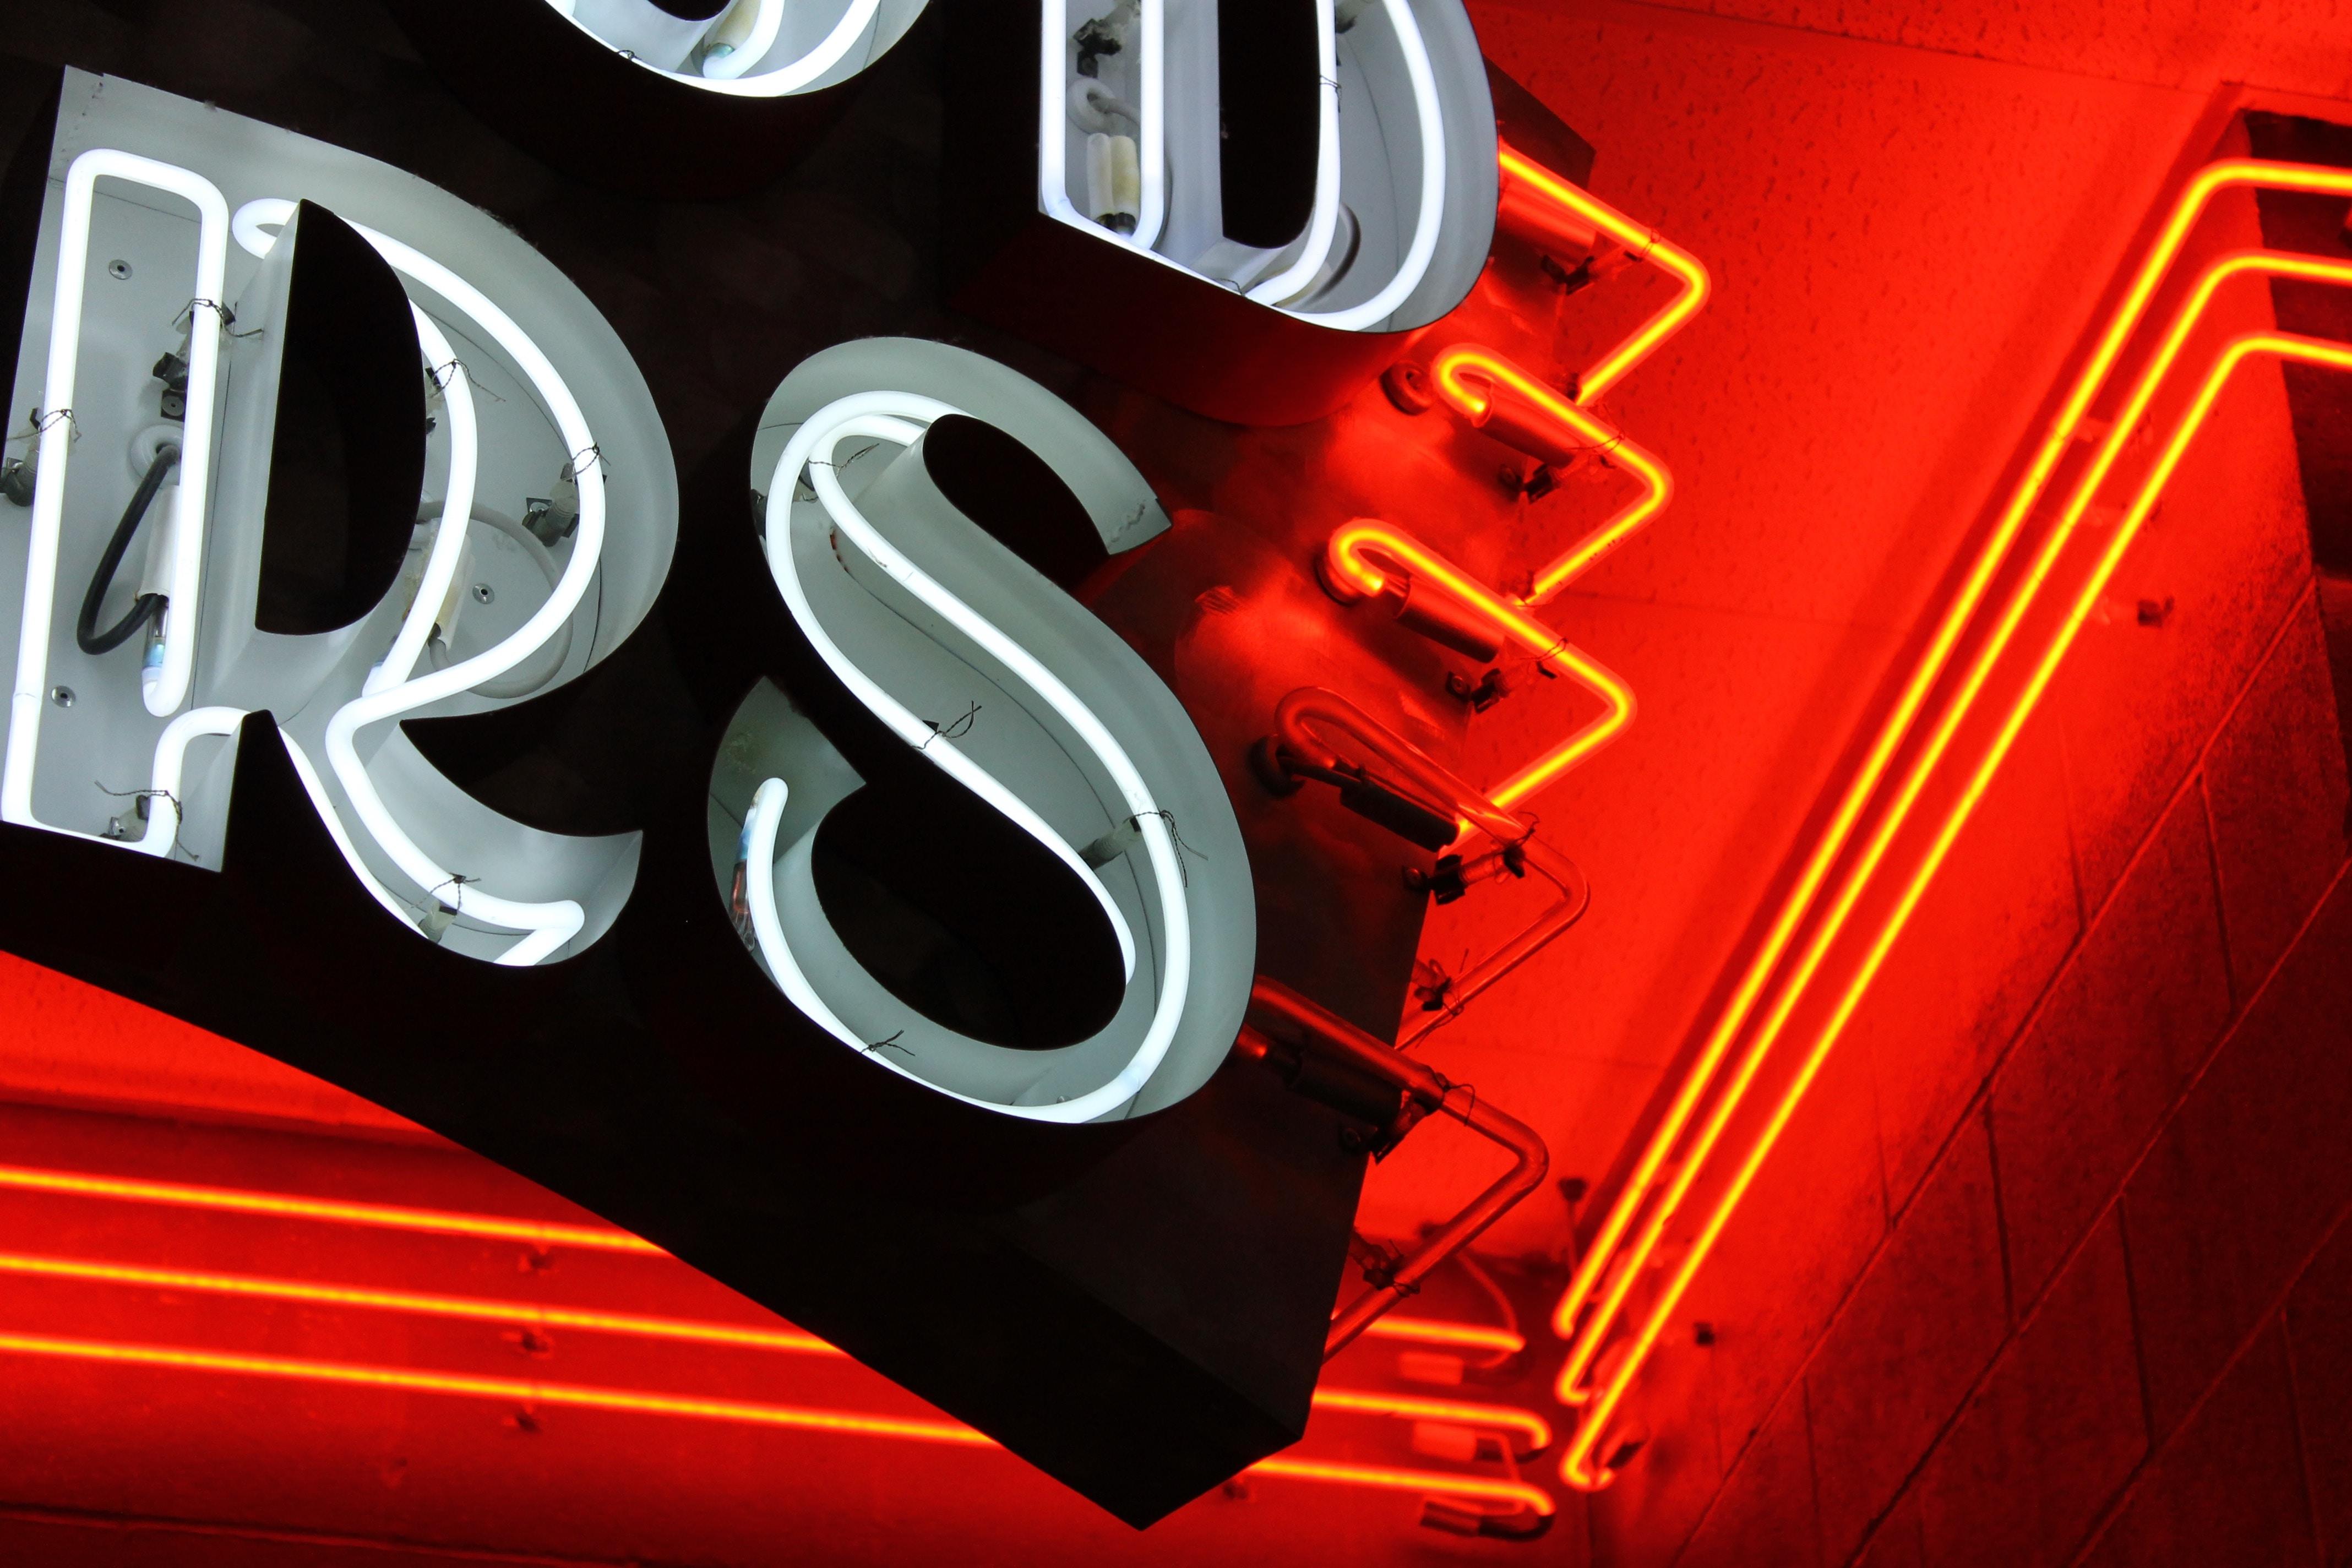 Best 100 Neon Sign Pictures Download Free Images On Unsplash Details Of  Lettering On Vintage Neon Sign Glowing Orange Light Up Signs Tumblr For Sale